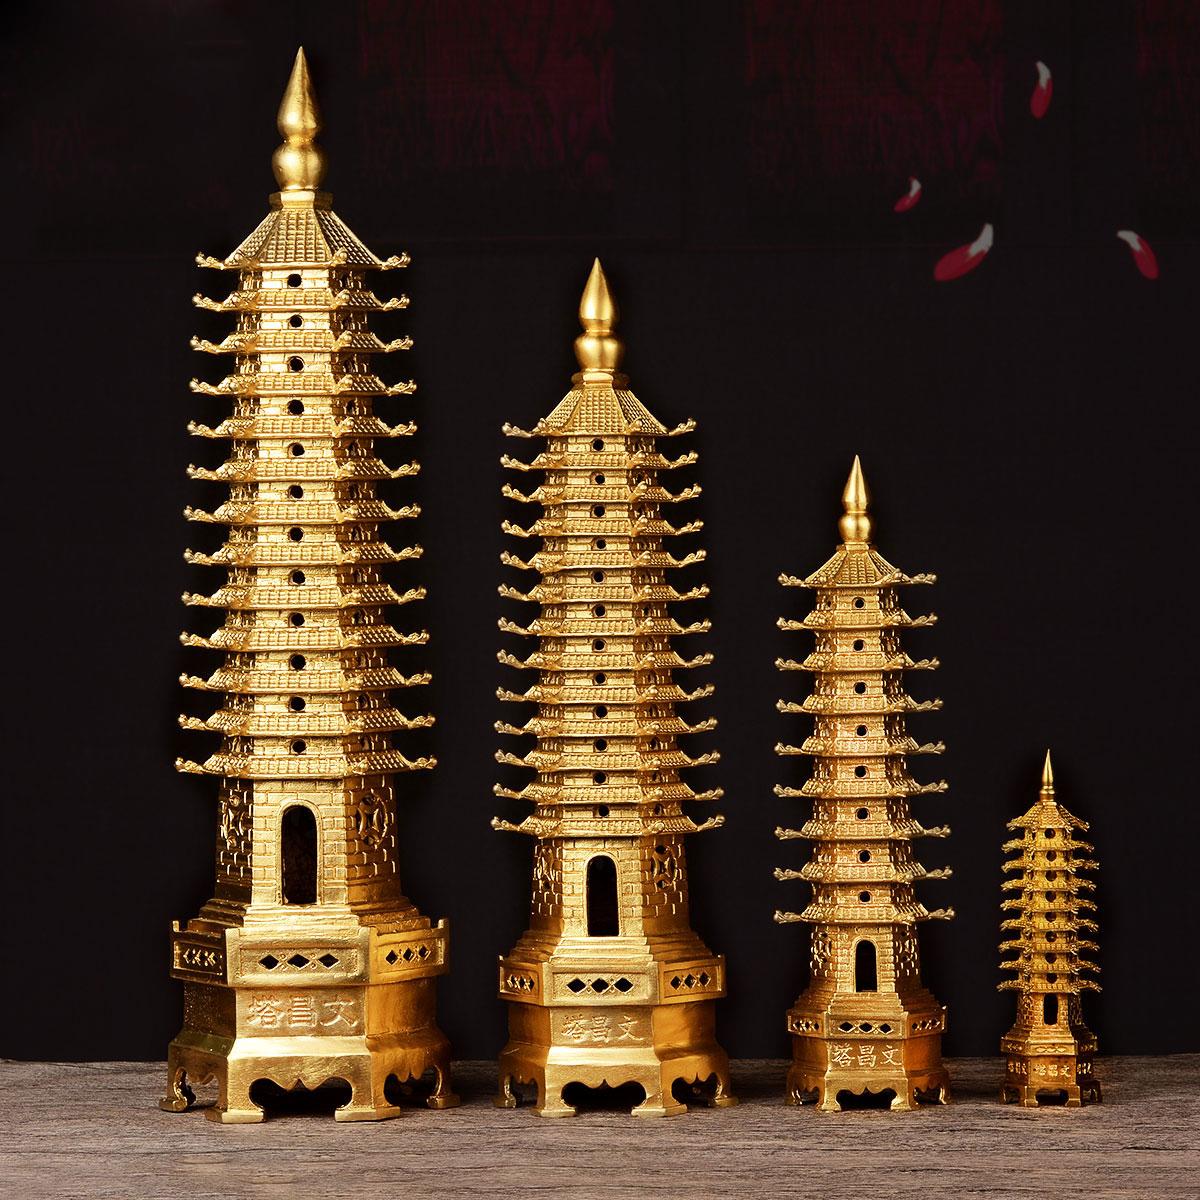 Статуэтки башни Вэньчан Артикул 573997972807